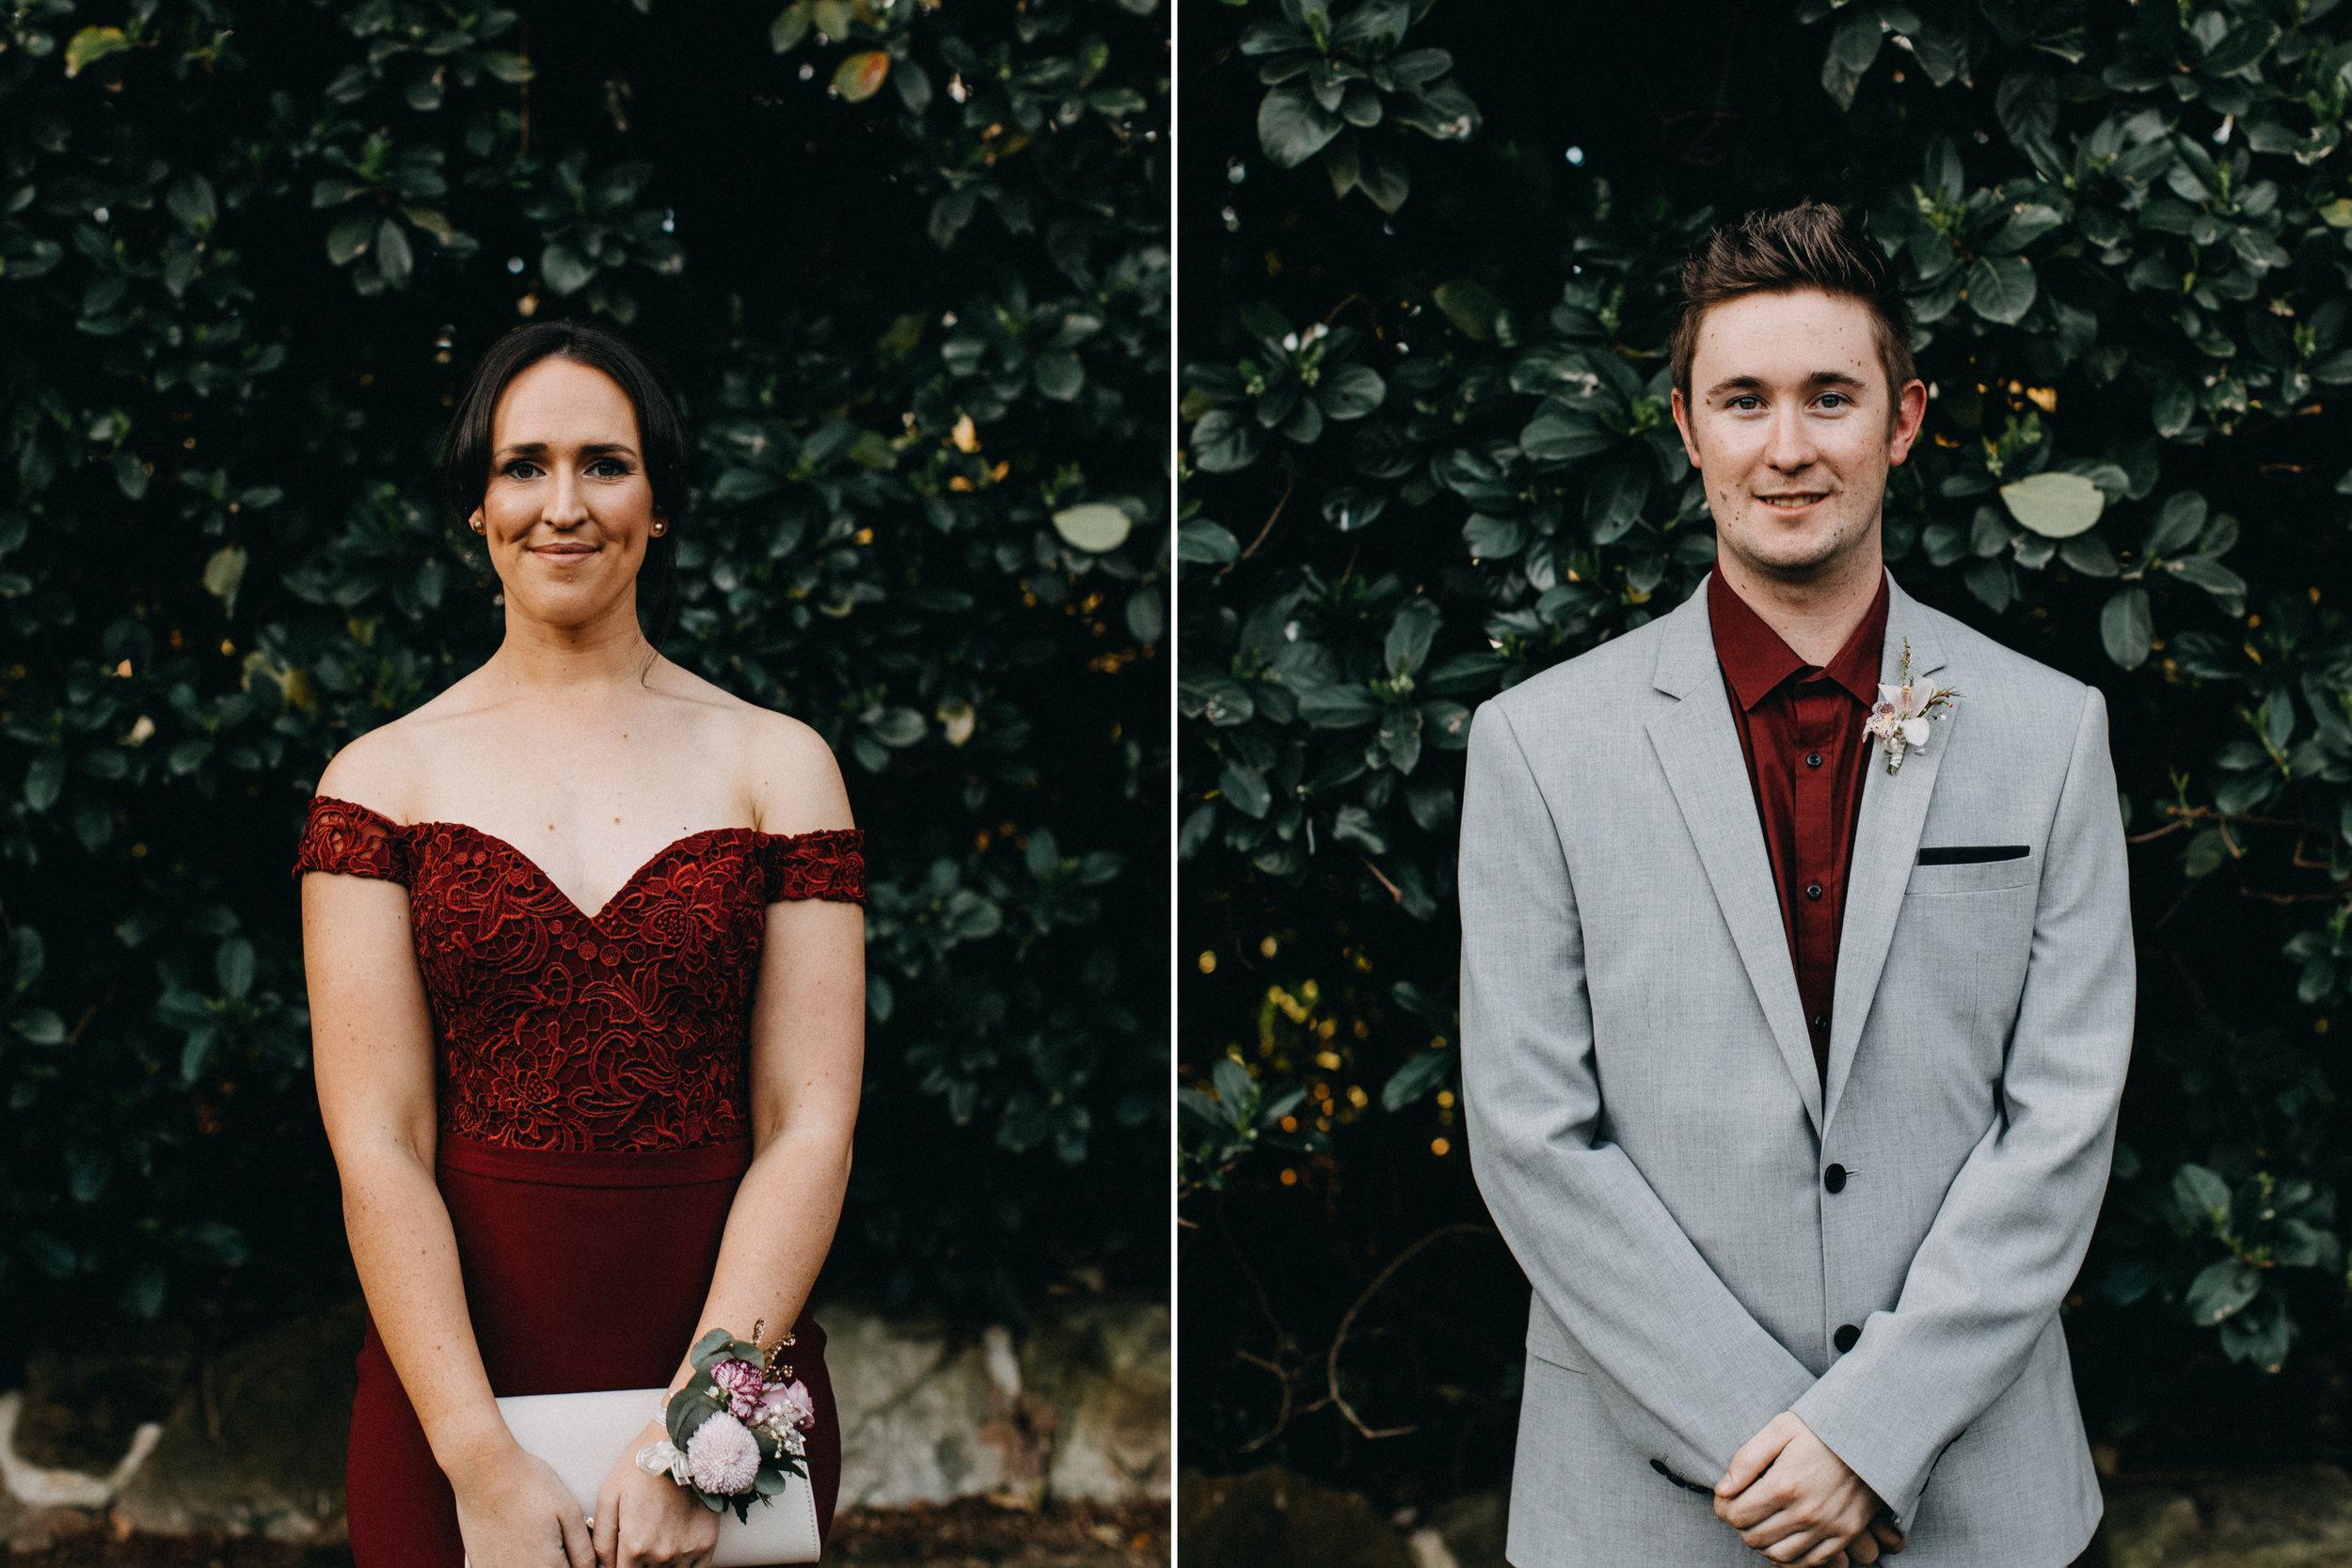 burnham-grove-camden-wedding-emilyobrienphotography-2.jpg